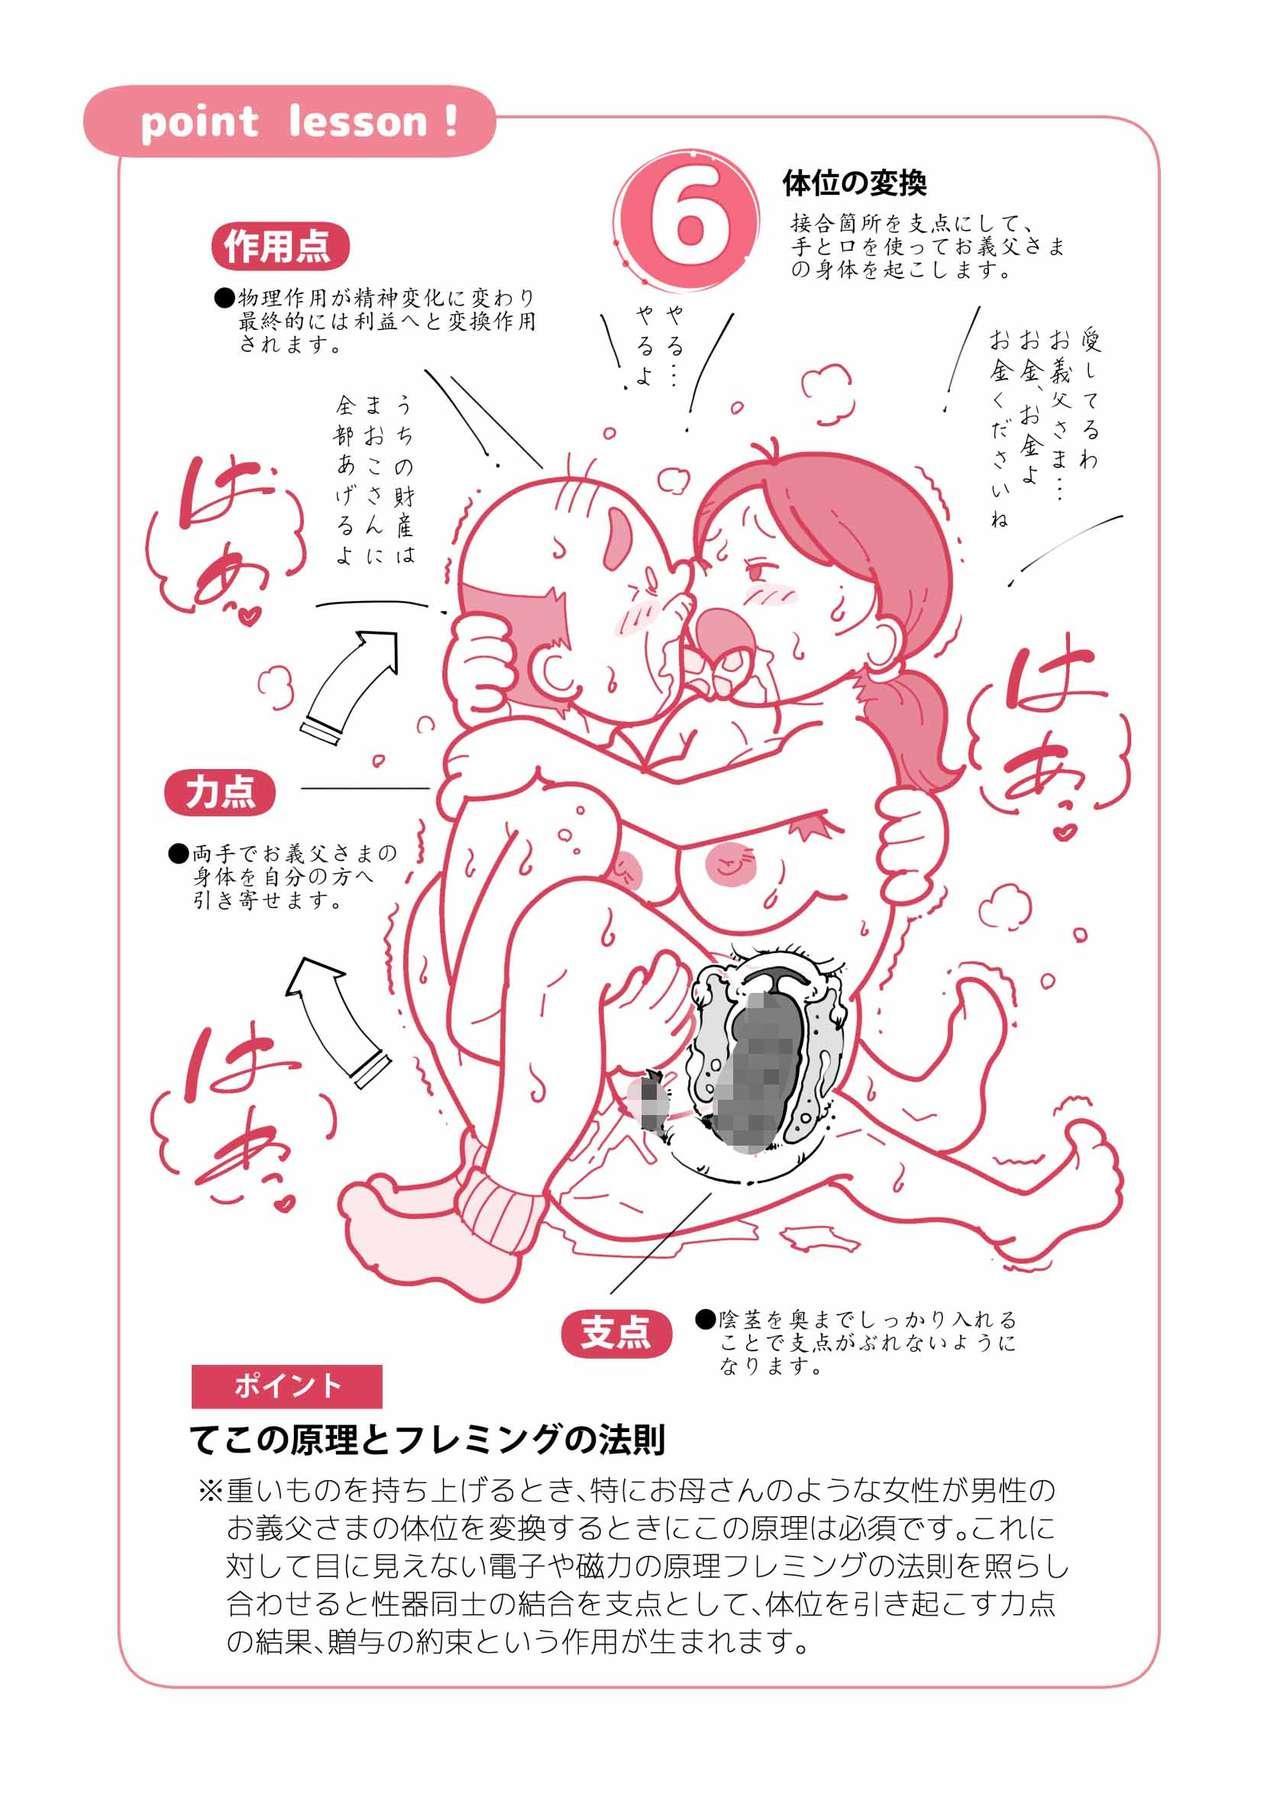 Isogasii Okaasan No Tamuno Sasa Rouzin Seikaigo | Guide for Elderly Sex Health Care to Busy Mom 58